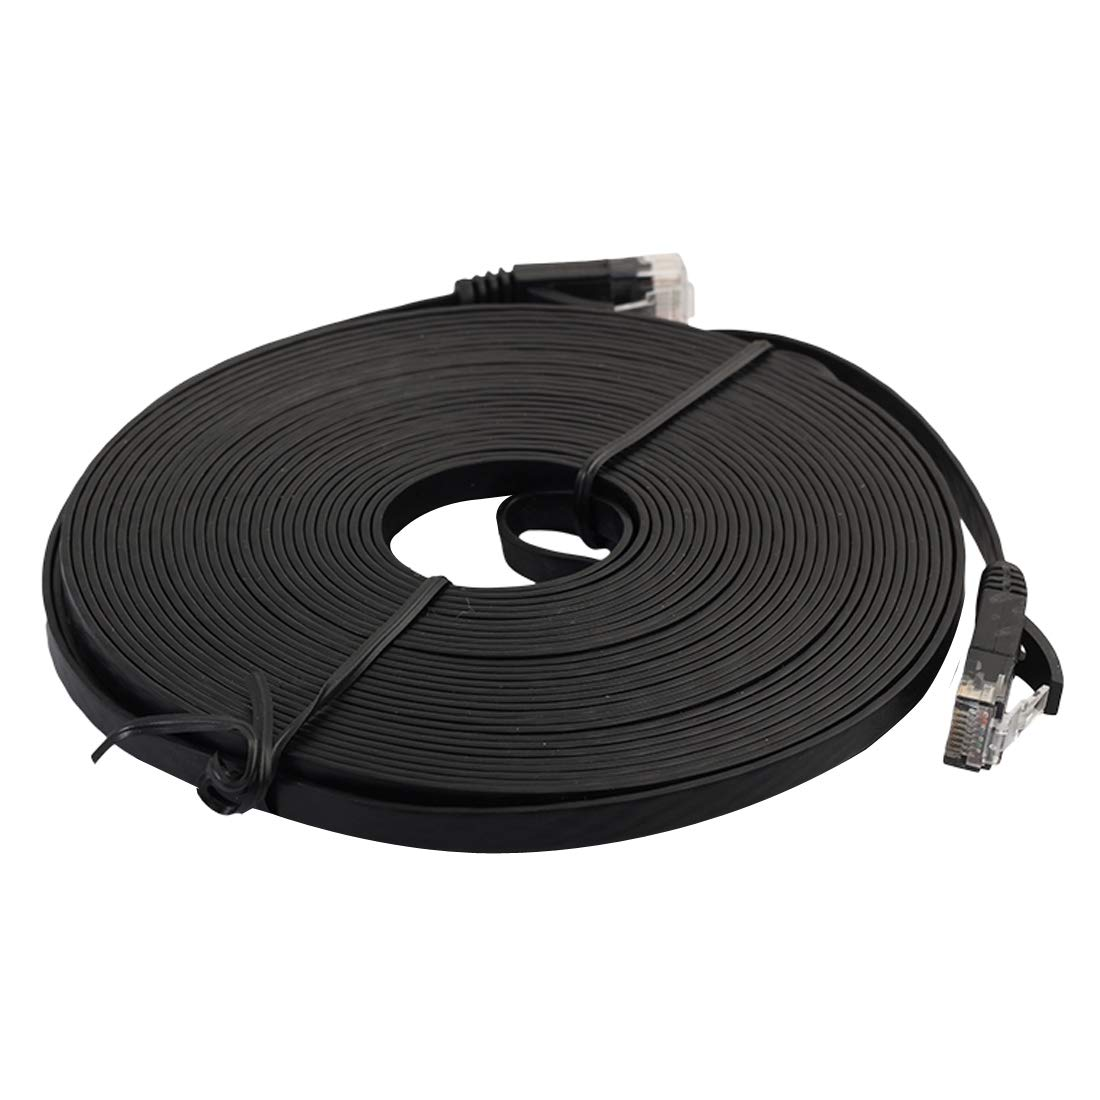 HEGGW 7.6m CAT6 Ultra-Thin Flat Ethernet Network LAN Cable Black Patch Lead RJ45 Color : Black